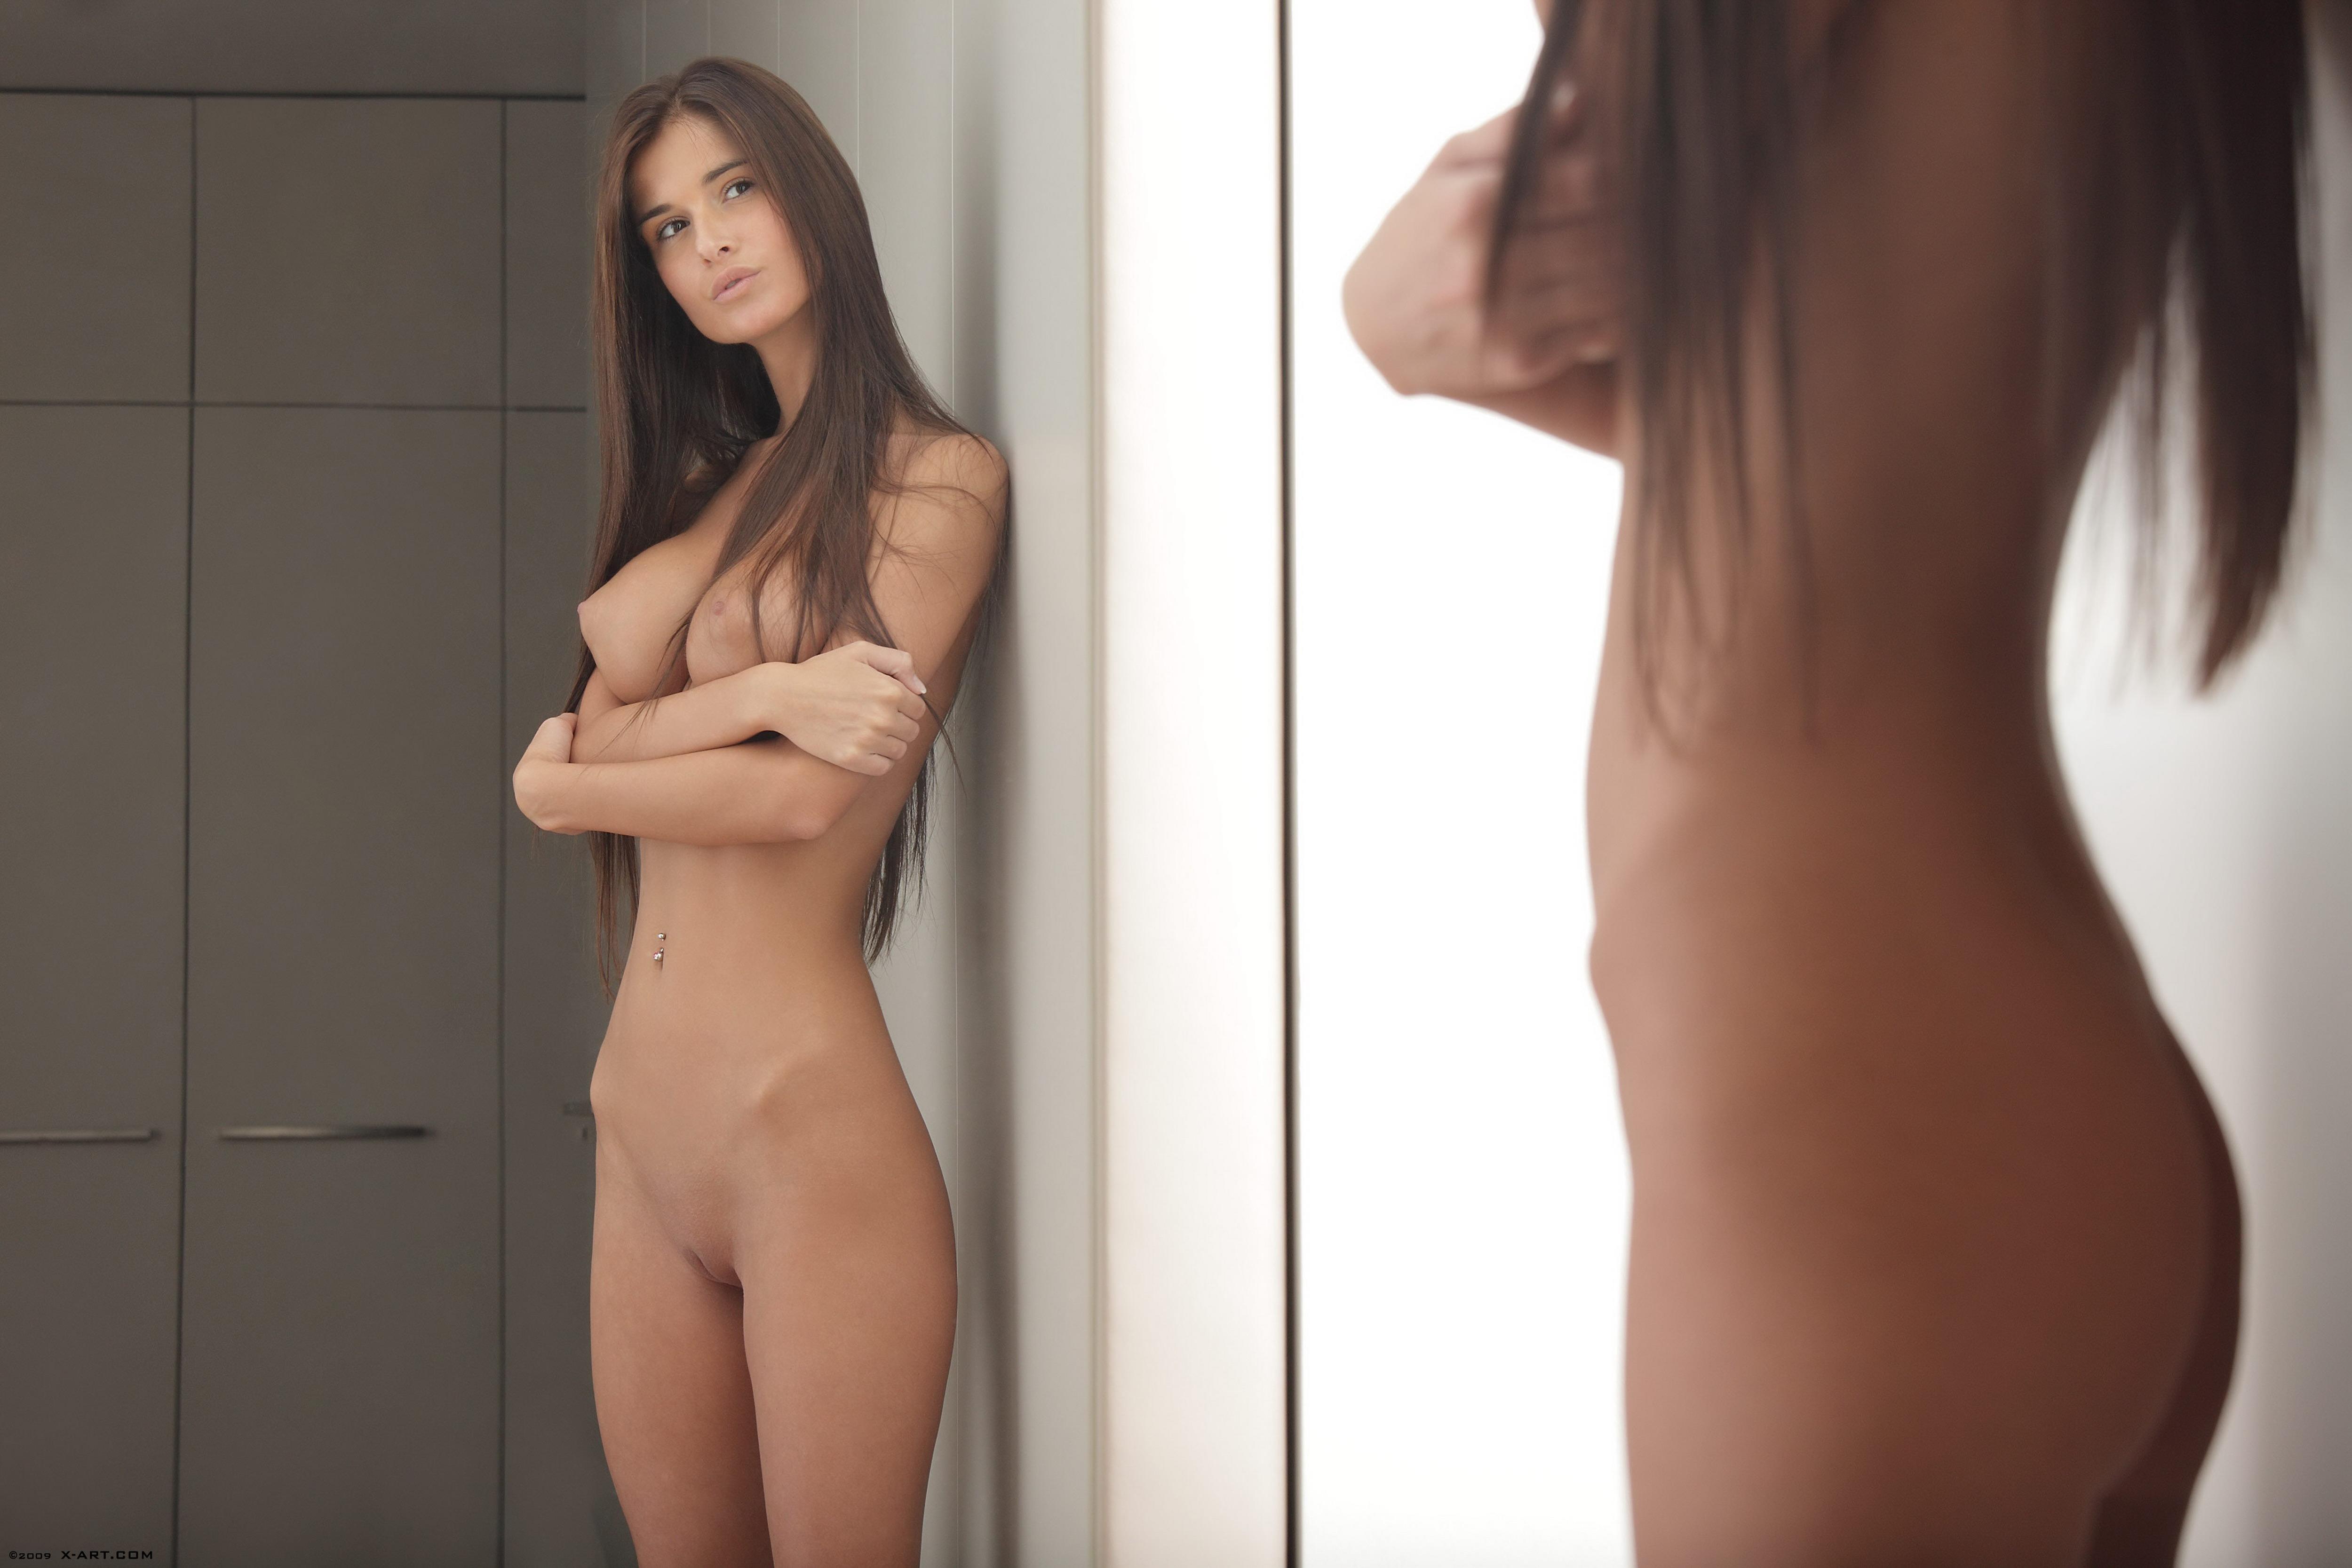 посмотреть анастасия волочкова порно фото